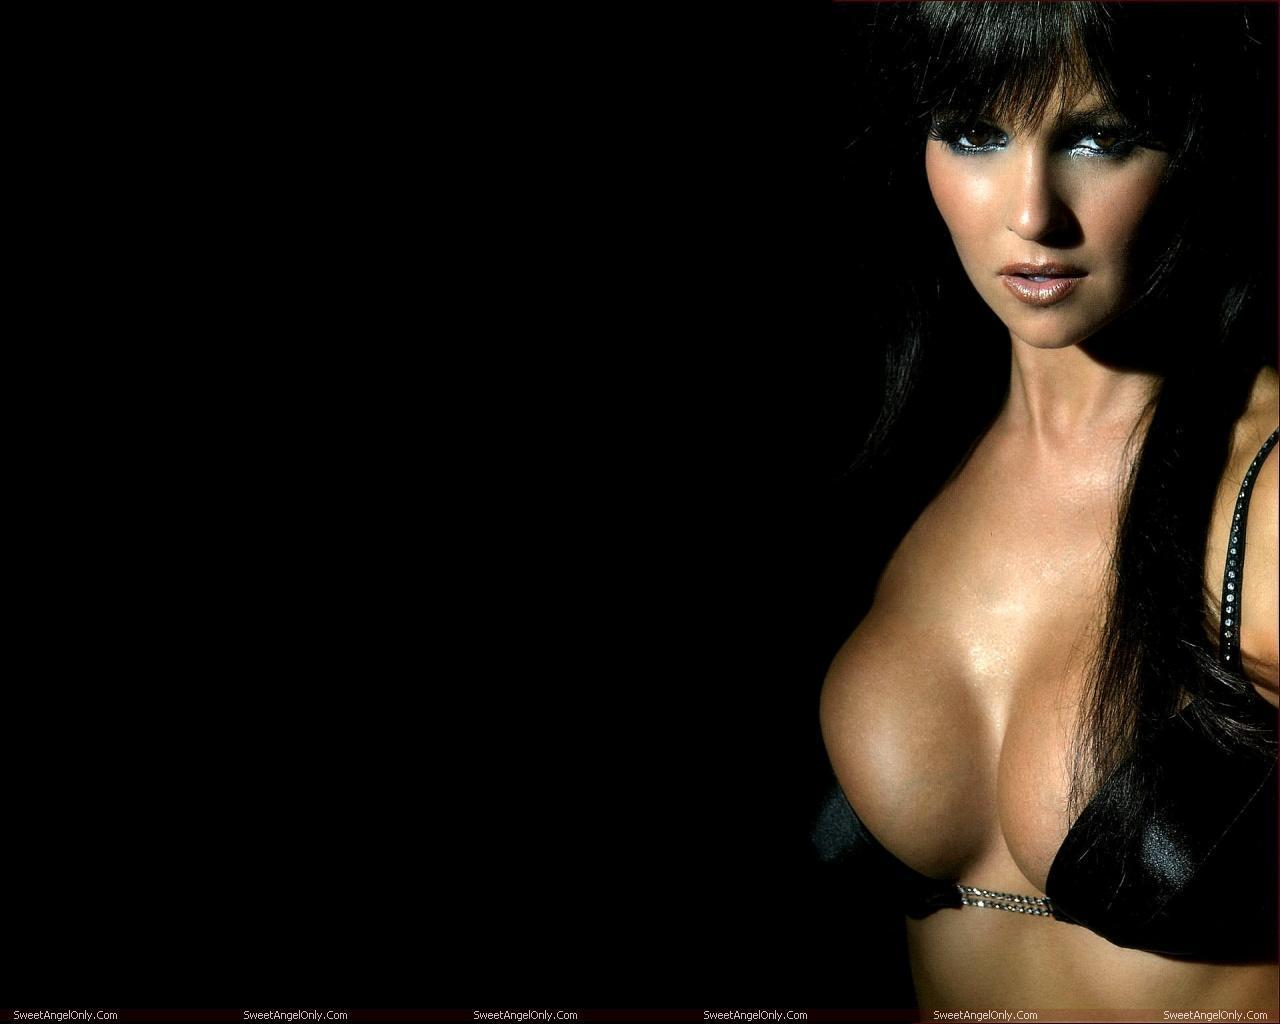 http://2.bp.blogspot.com/-XNZWXzObZjw/TWZR6YYENEI/AAAAAAAAEng/q_ad1xei8IQ/s1600/actress_jennifer_ellison_hot_wallpapers_in_bikini_sweetangelonly_10.jpg